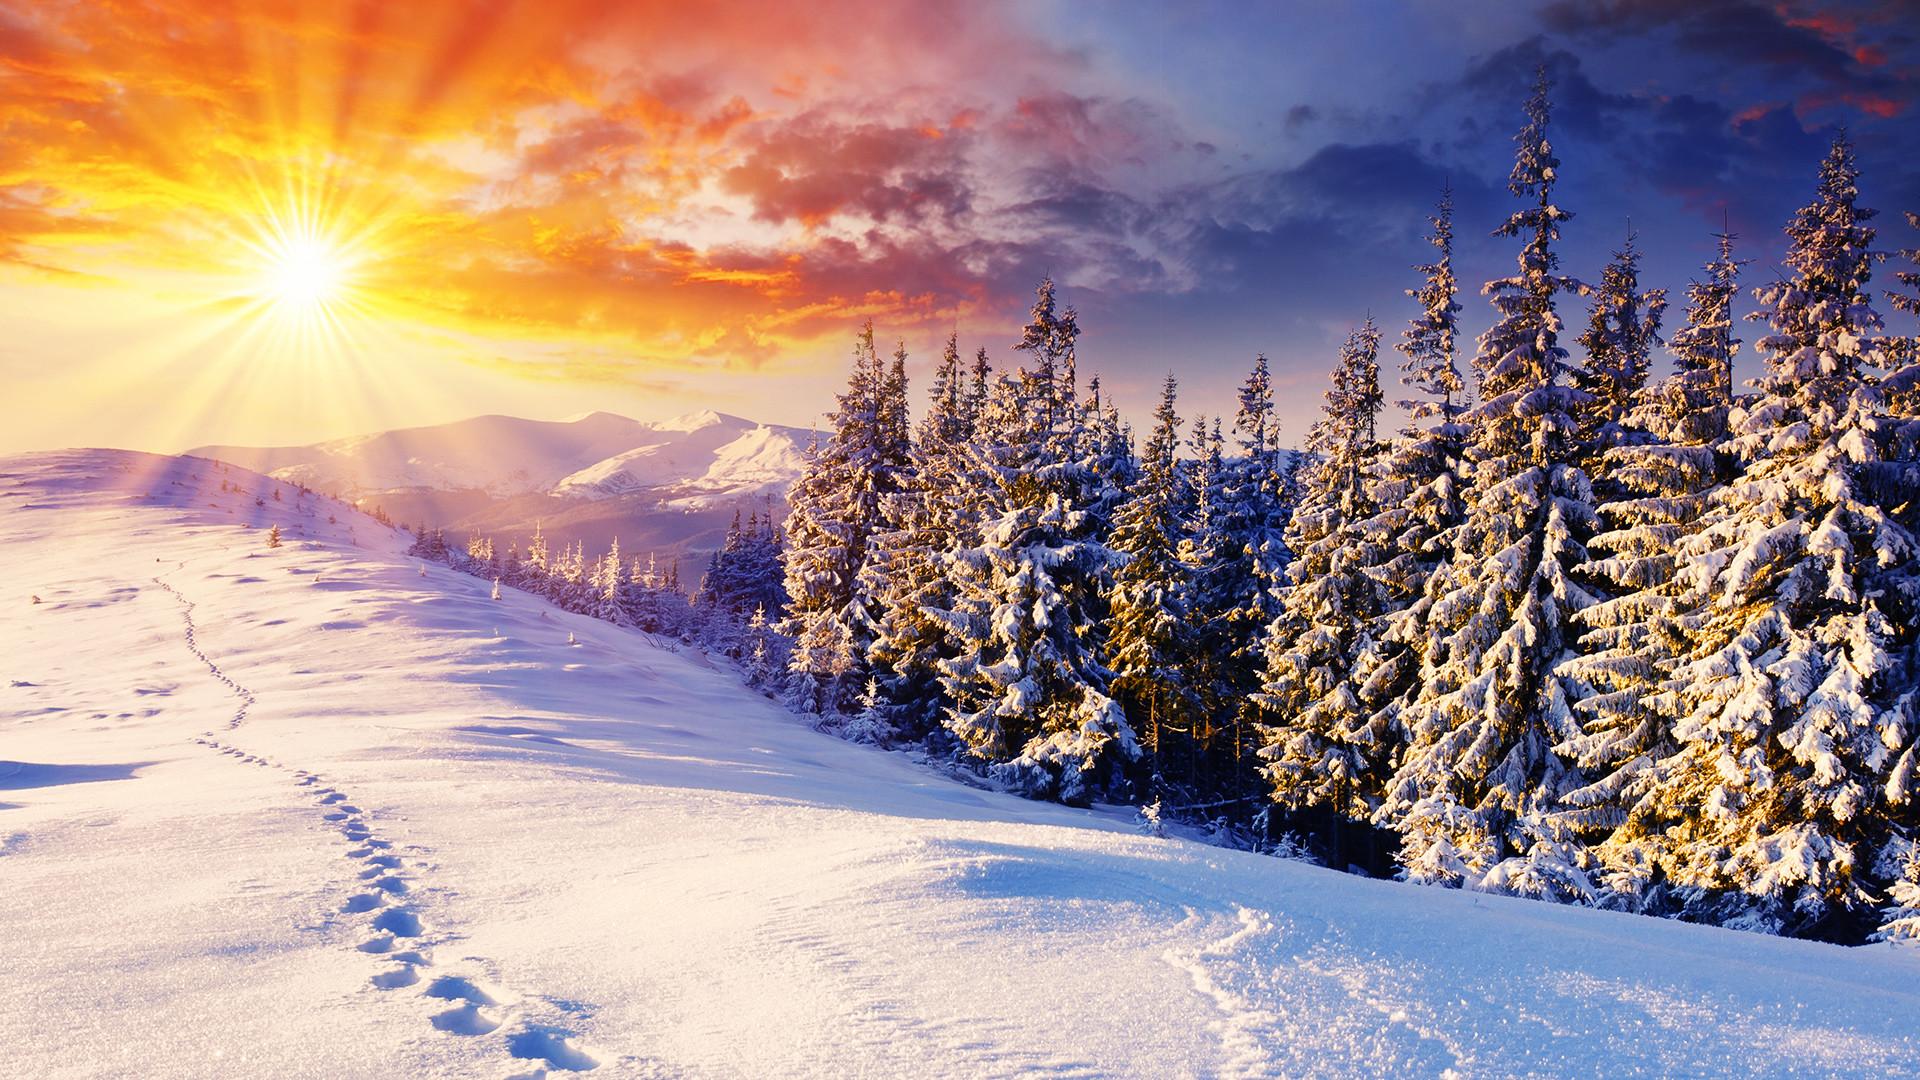 Winter Wallpaper HD (68+ images)